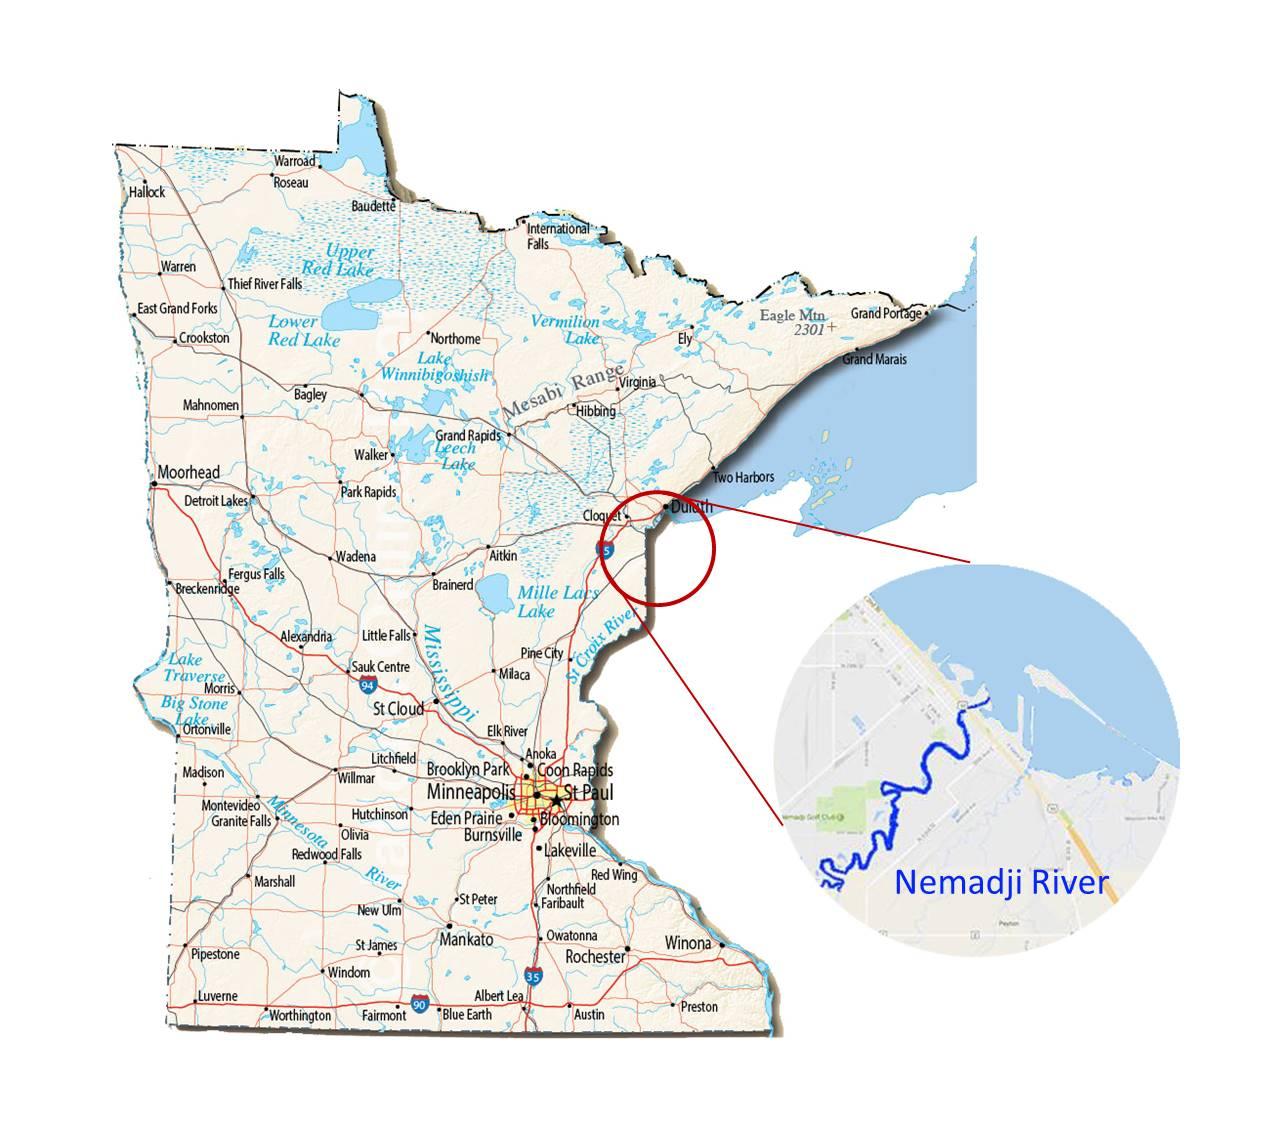 Corps News — Conservation Corps Minnesota & Iowa on minnesota snow symbols, southern minnesota fishing lakes, map of lakes, chisago lakes, minnesota points of interest, southern minnesota resorts on lakes, minnesota dnr lake finder, otter tail county lakes, art in minnesota lakes, minnesota dnr lake maps, minnesota lakes area map, minnesota state map with lakes, northern minnesota lakes, winter in minnesota lakes, minnesota outline, minnesota themed projects, minnesota bike trails maps, minnesota counties, minnesota lakes wallpaper,